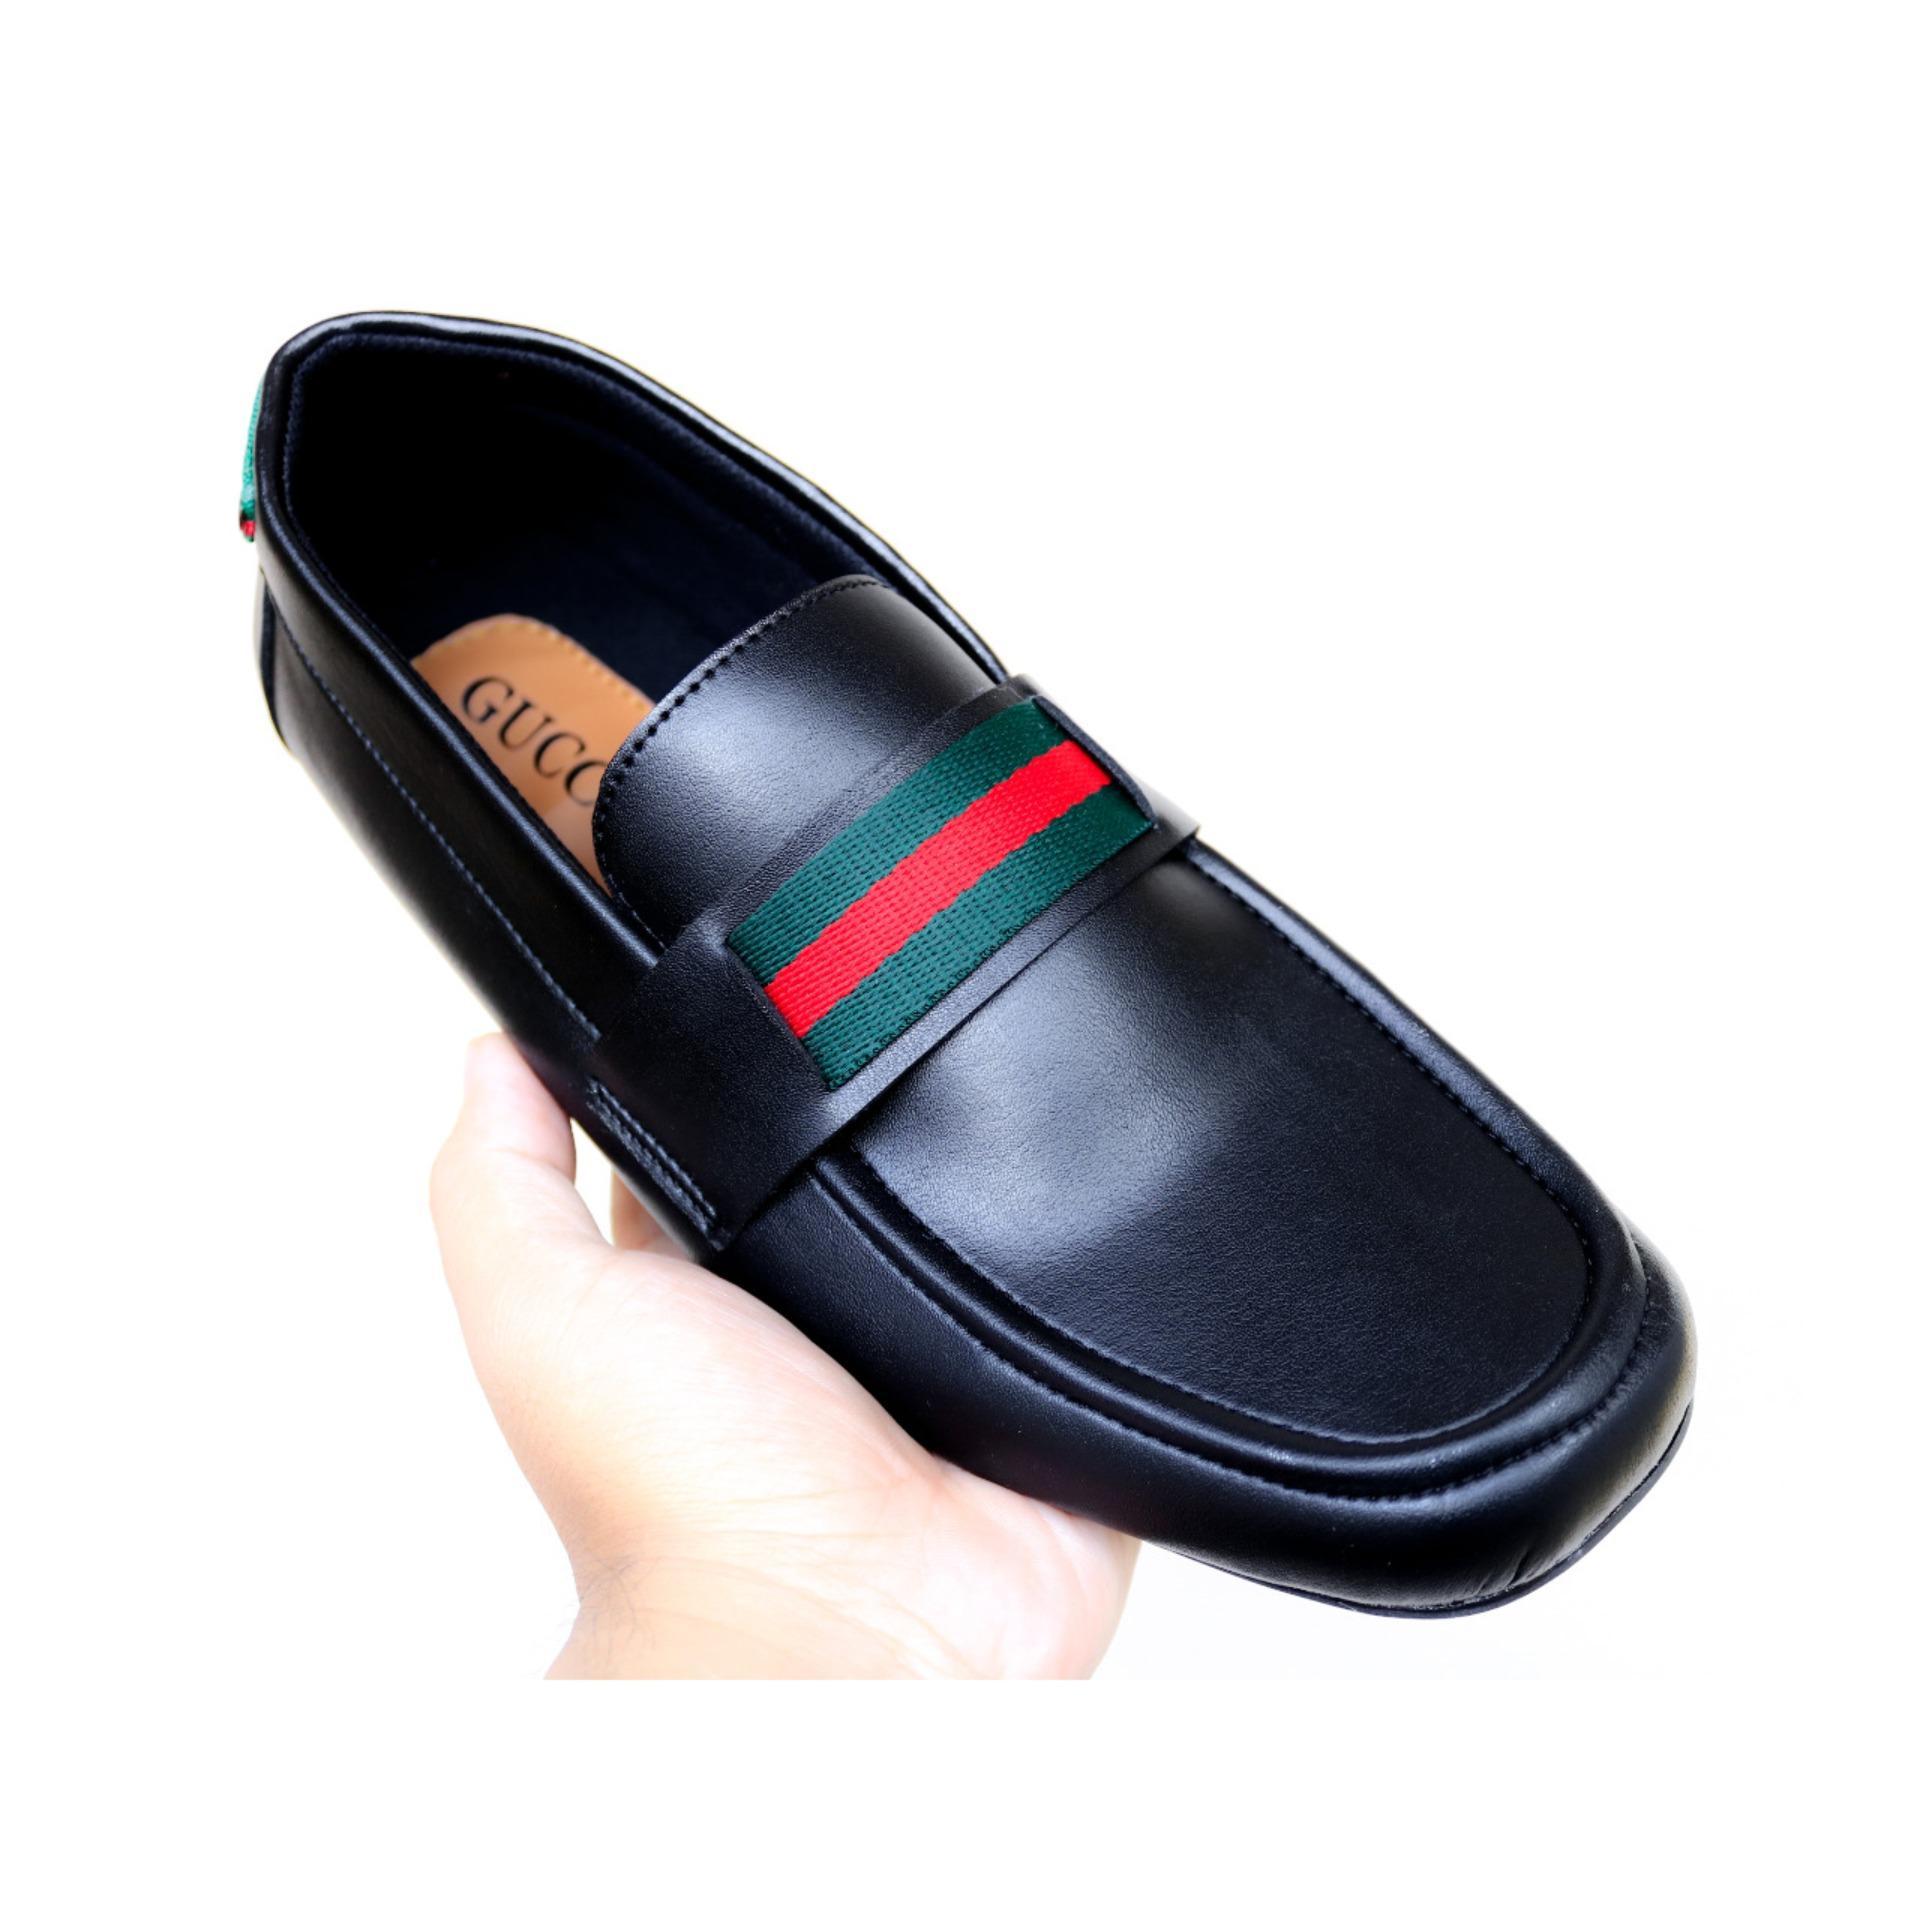 Sepatu kulit Slip-on (Guci) Pria dan Kasual Pria - Multi Polos (Lokal)